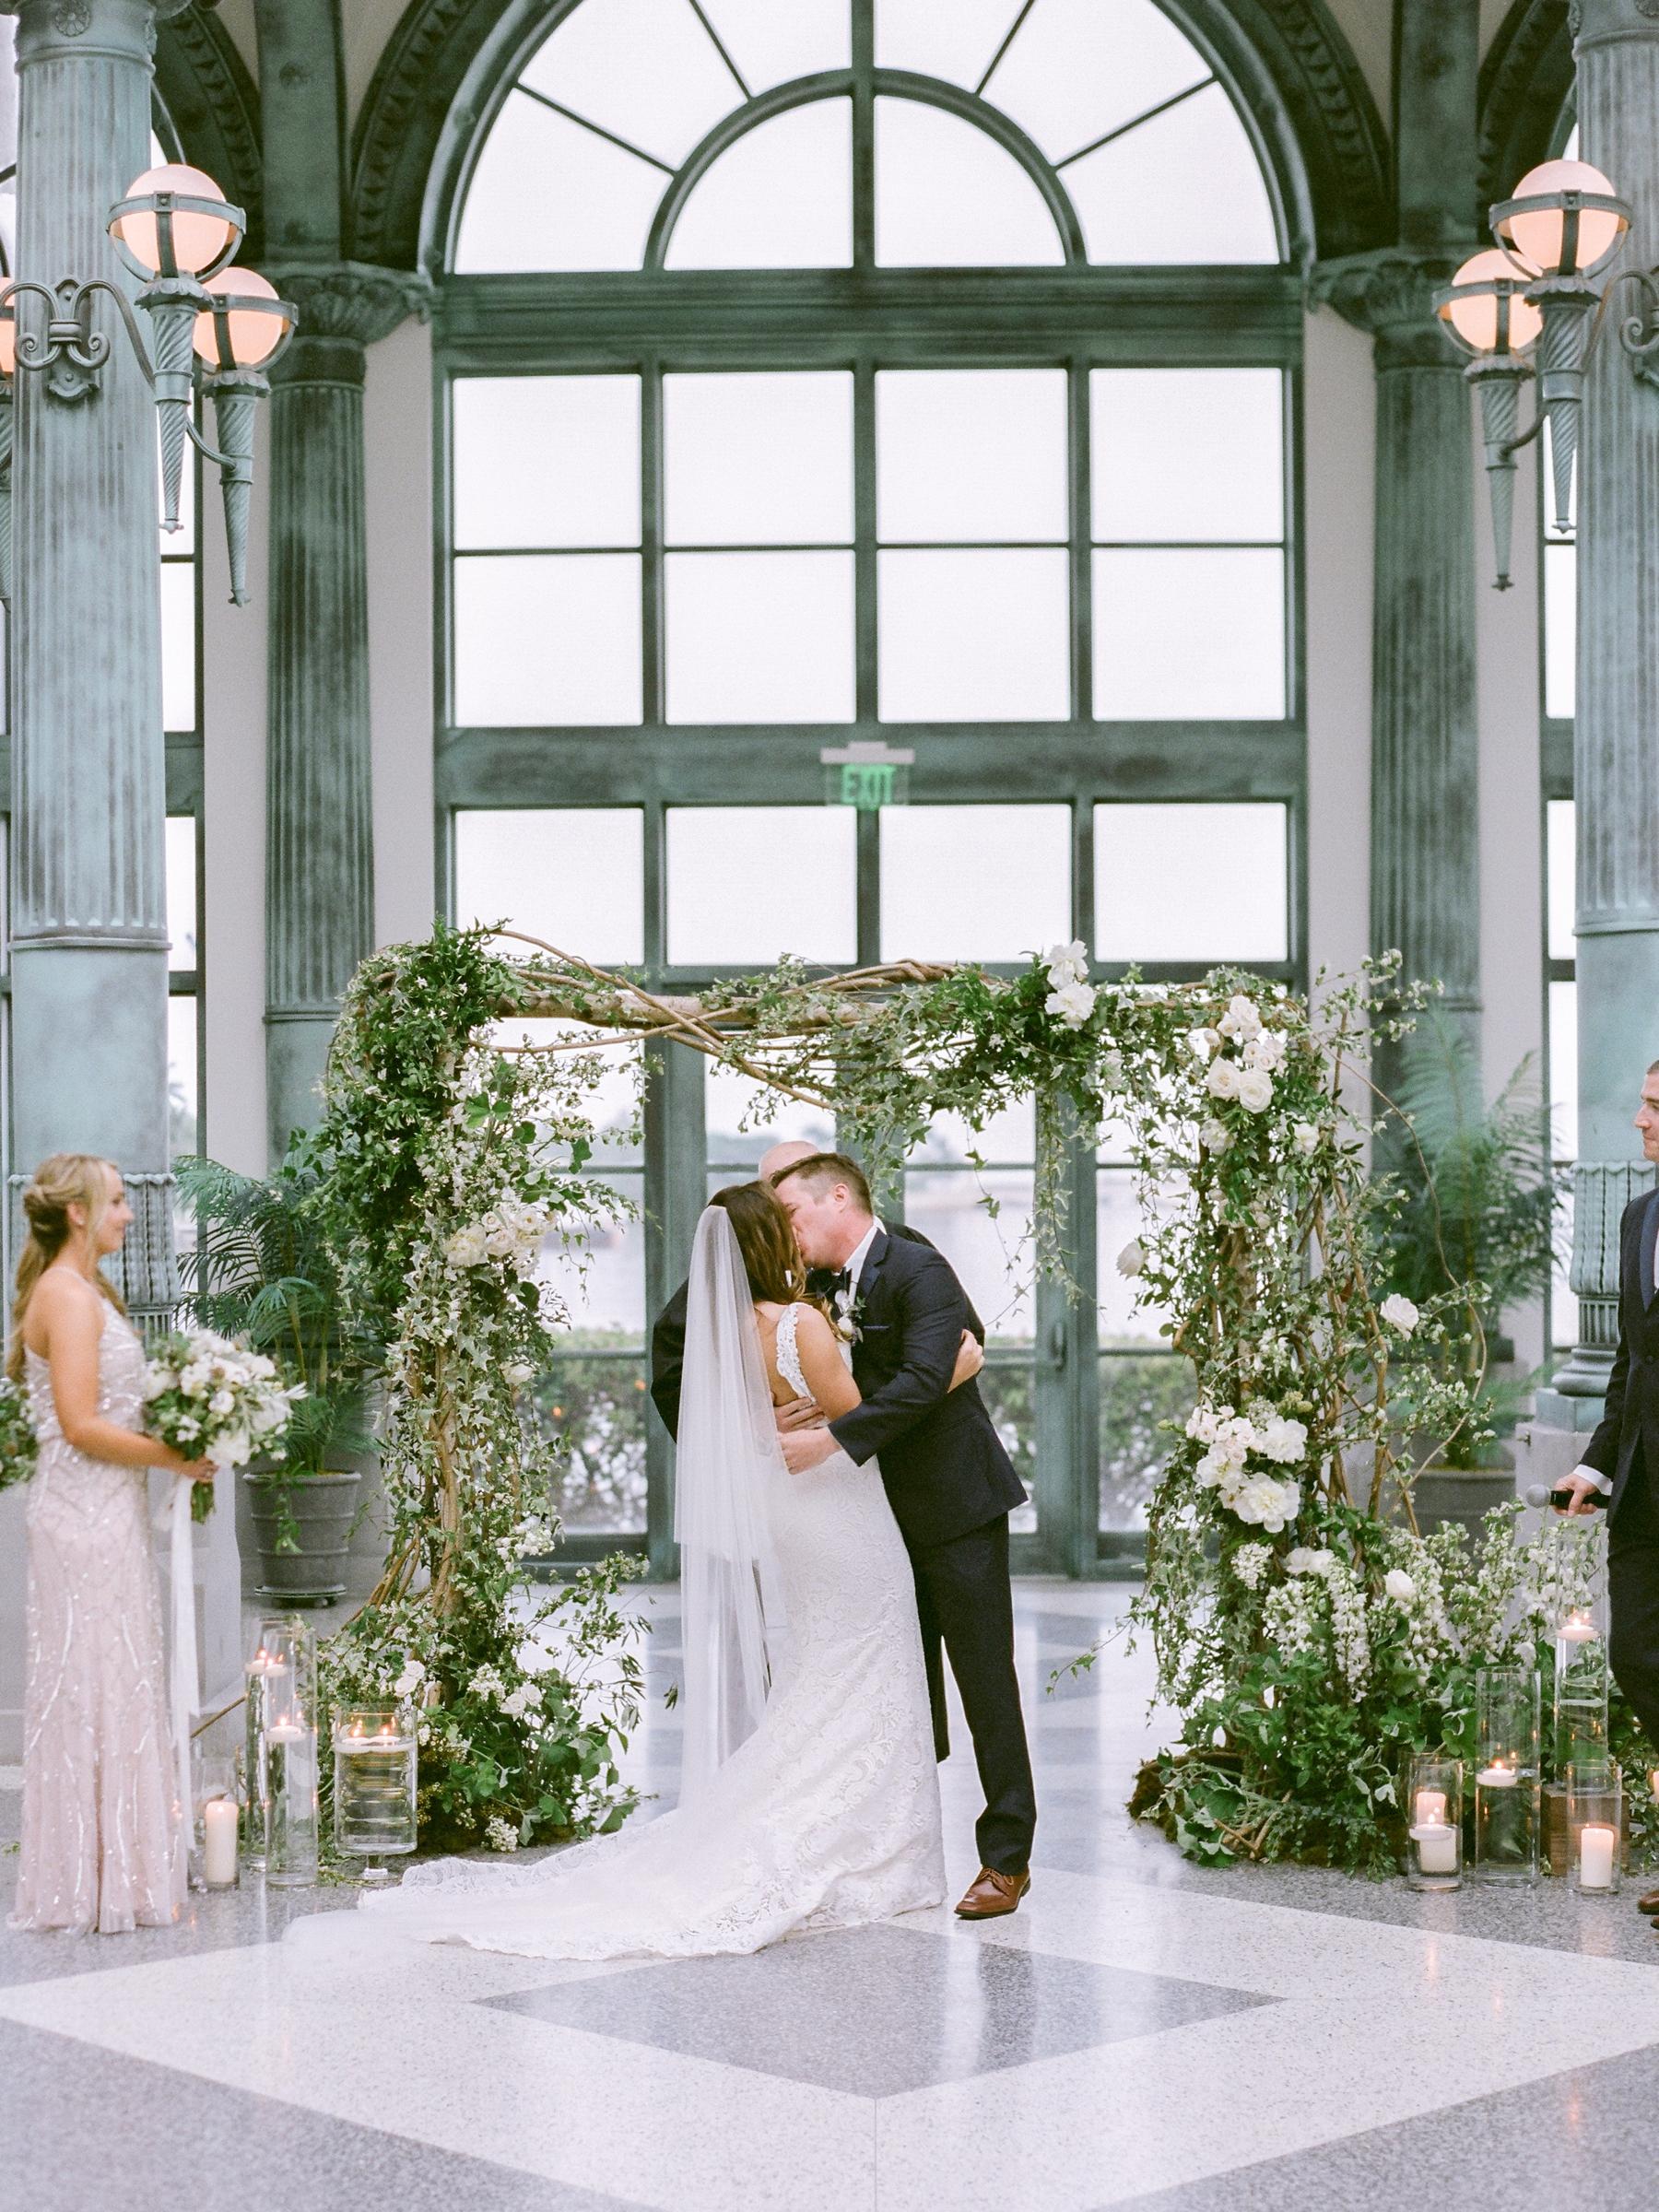 Flagler Museum wedding photographed on film